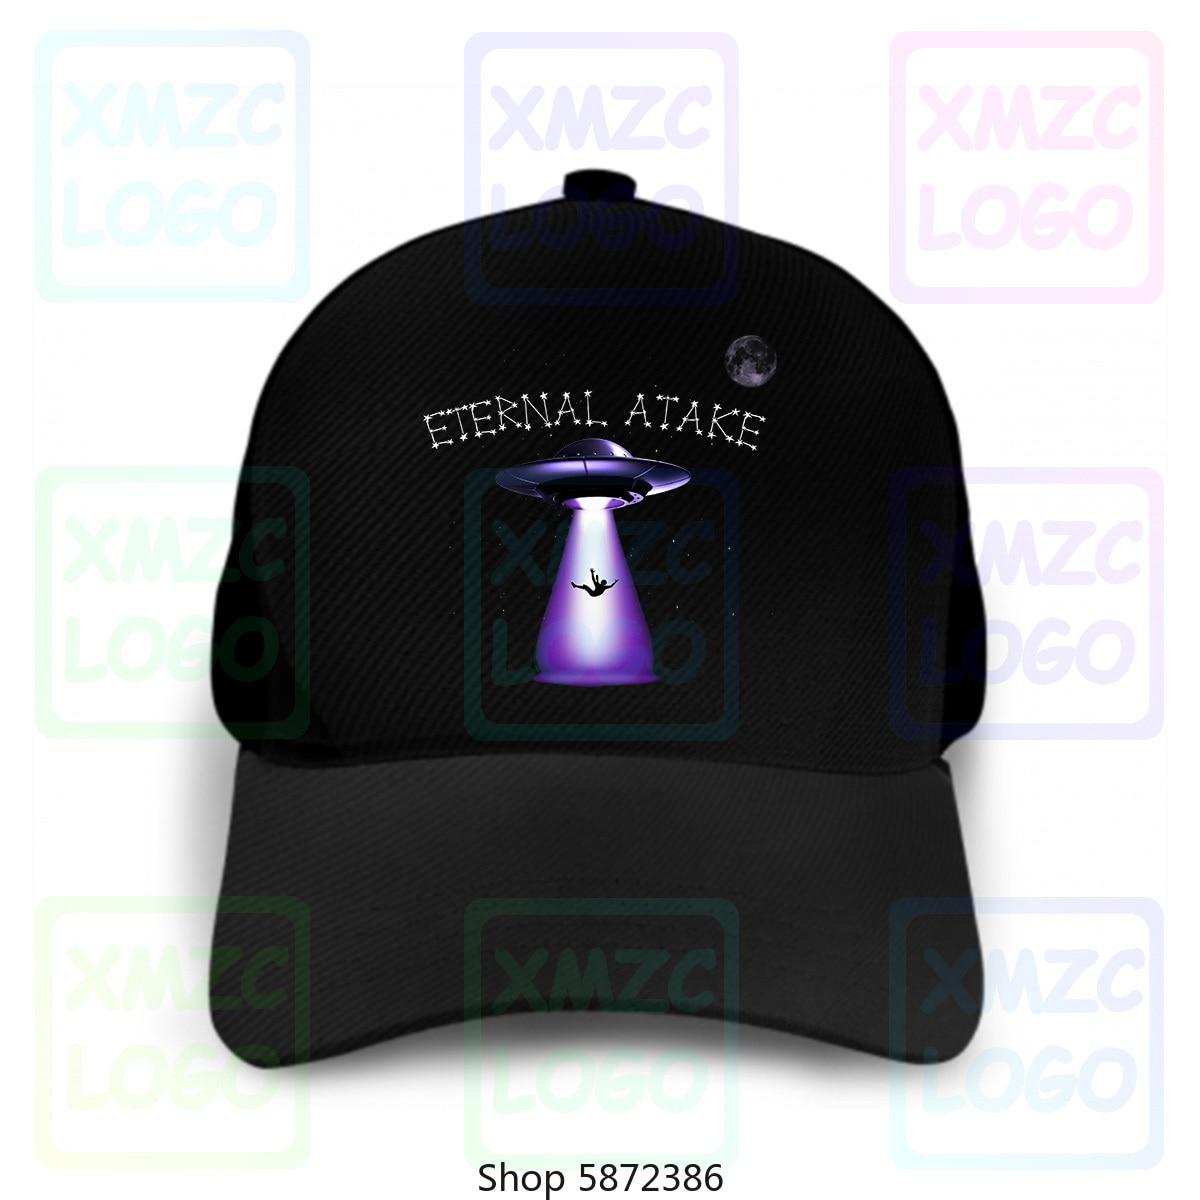 White Zombie Baseball Cap Tour Concert 1992 La Sexorcisto Baseball Cap Black For Fan Reprint Baseball Cap Hats Women Men